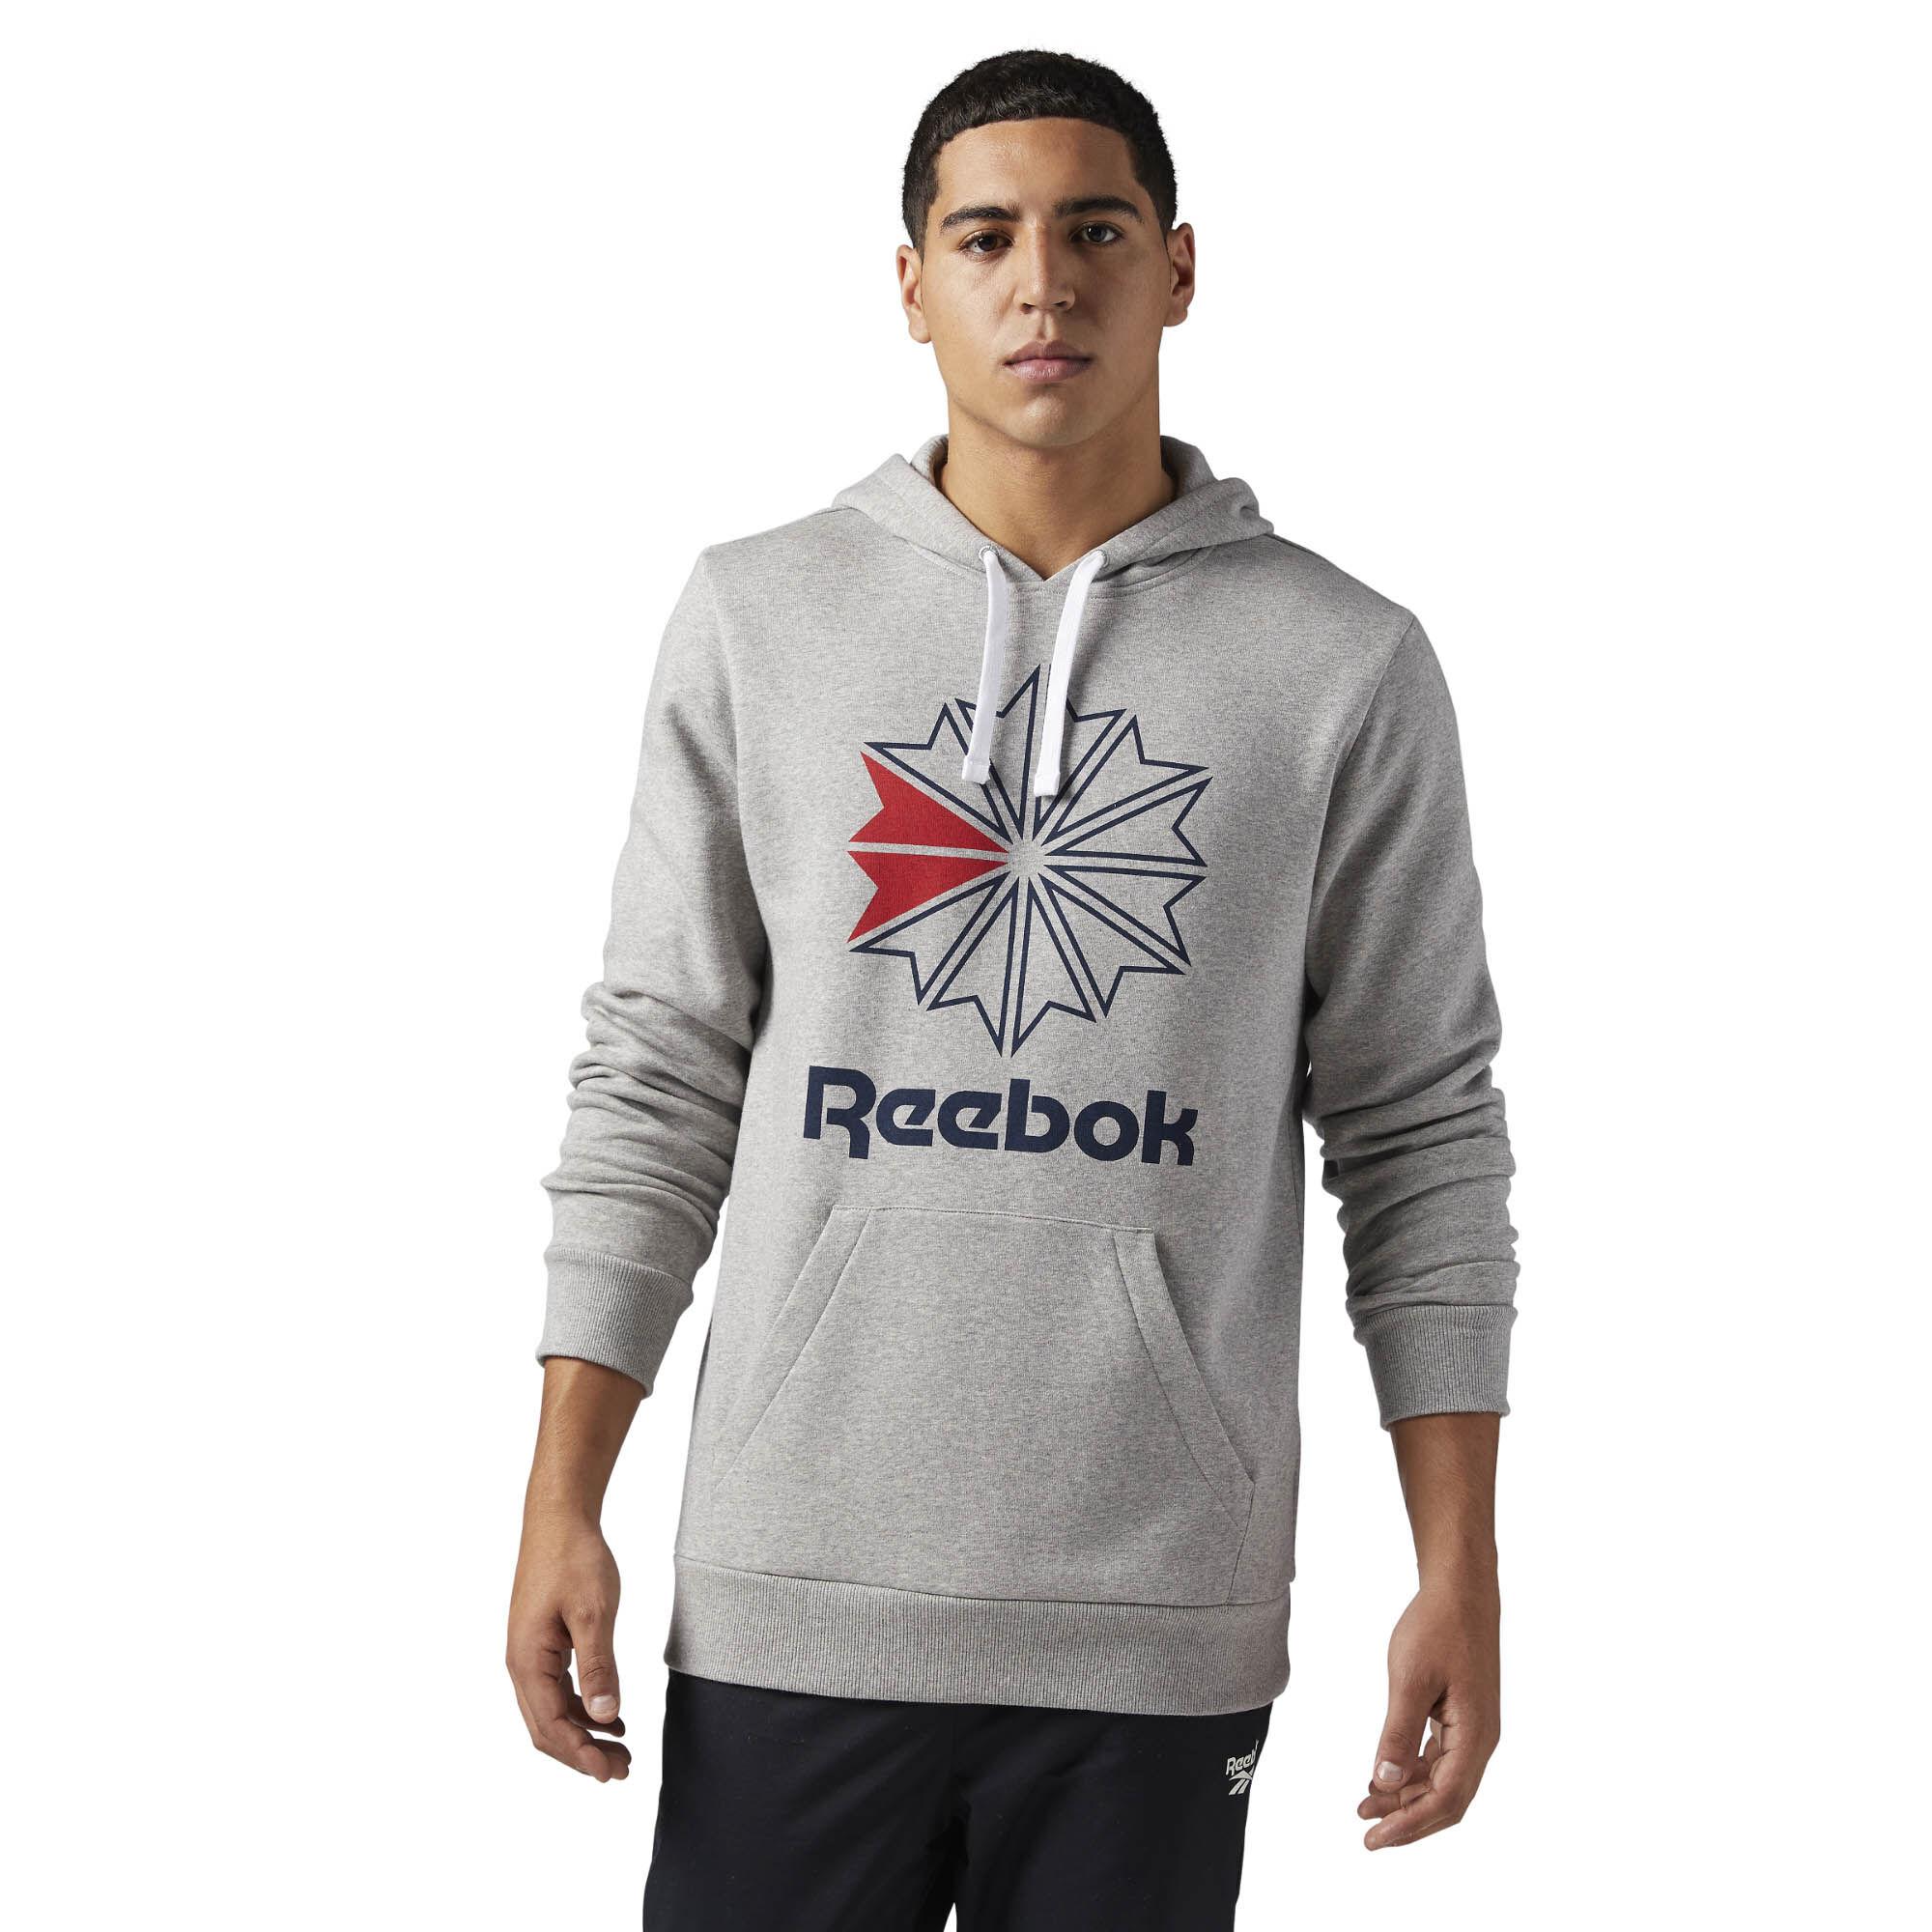 reebok classic mens clothing